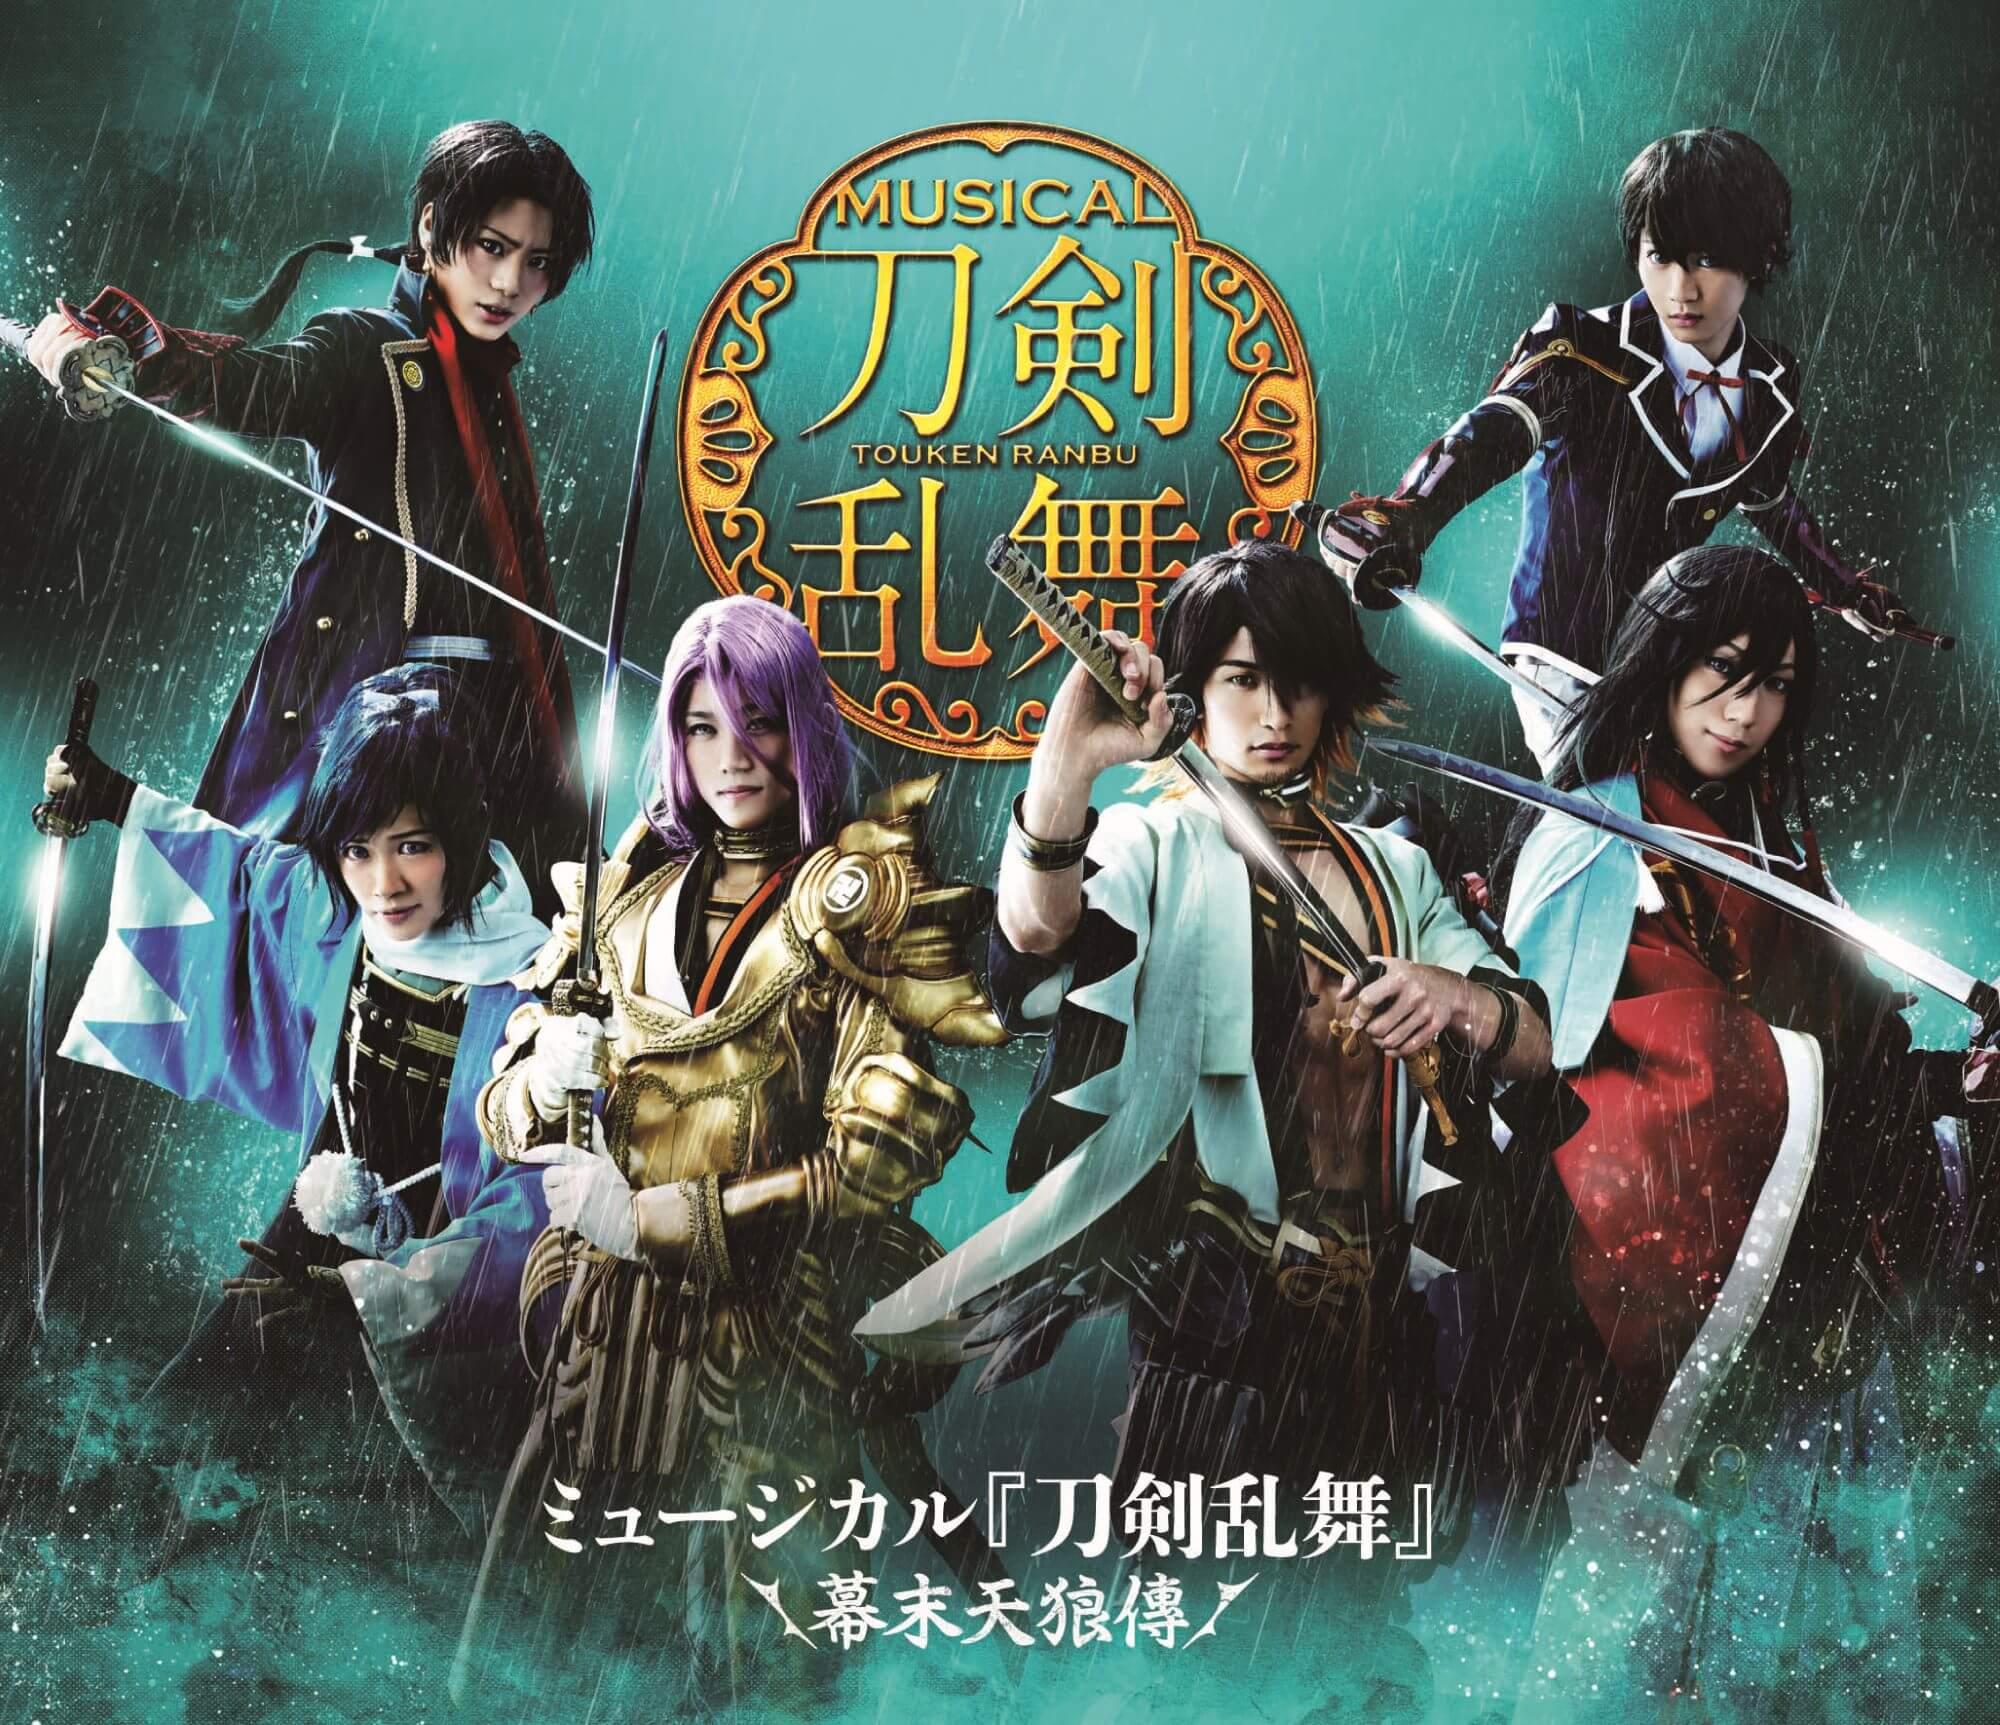 EMPB-2 / ミュージカル『刀剣乱舞』 〜幕末天狼傳〜 / ミュージカル『刀剣乱舞』 / Blu-ray